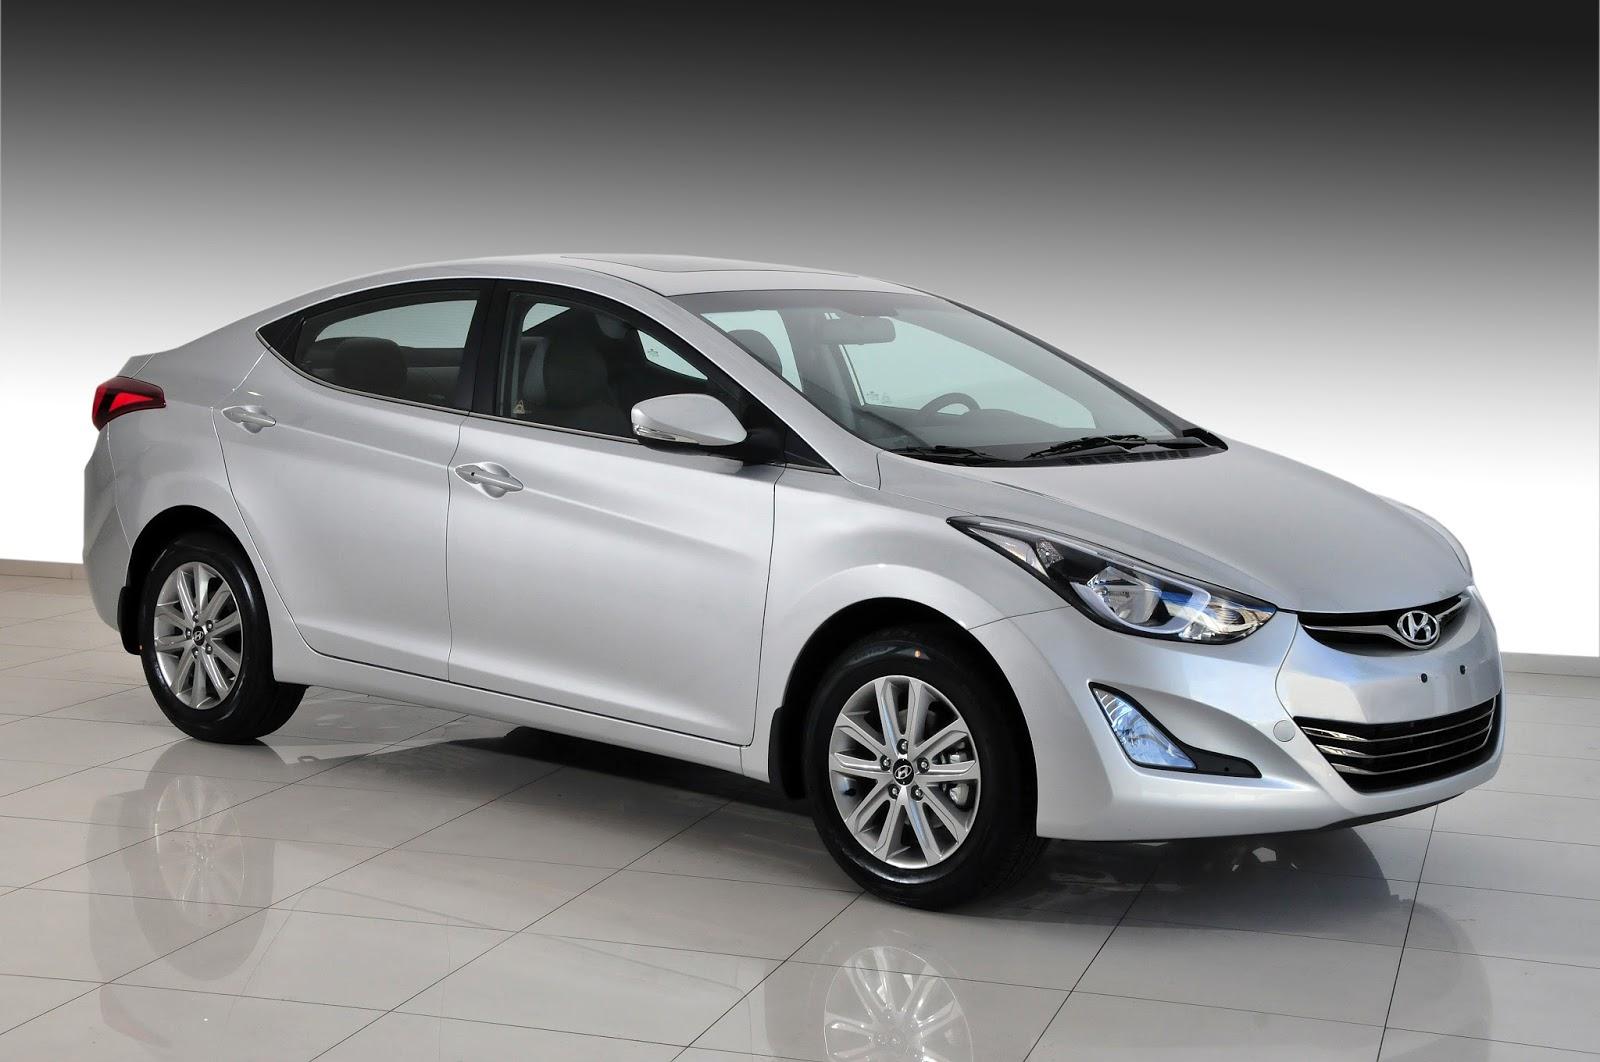 Concettomotors Hyundai New Elantra 233 Eleito Compra Certa